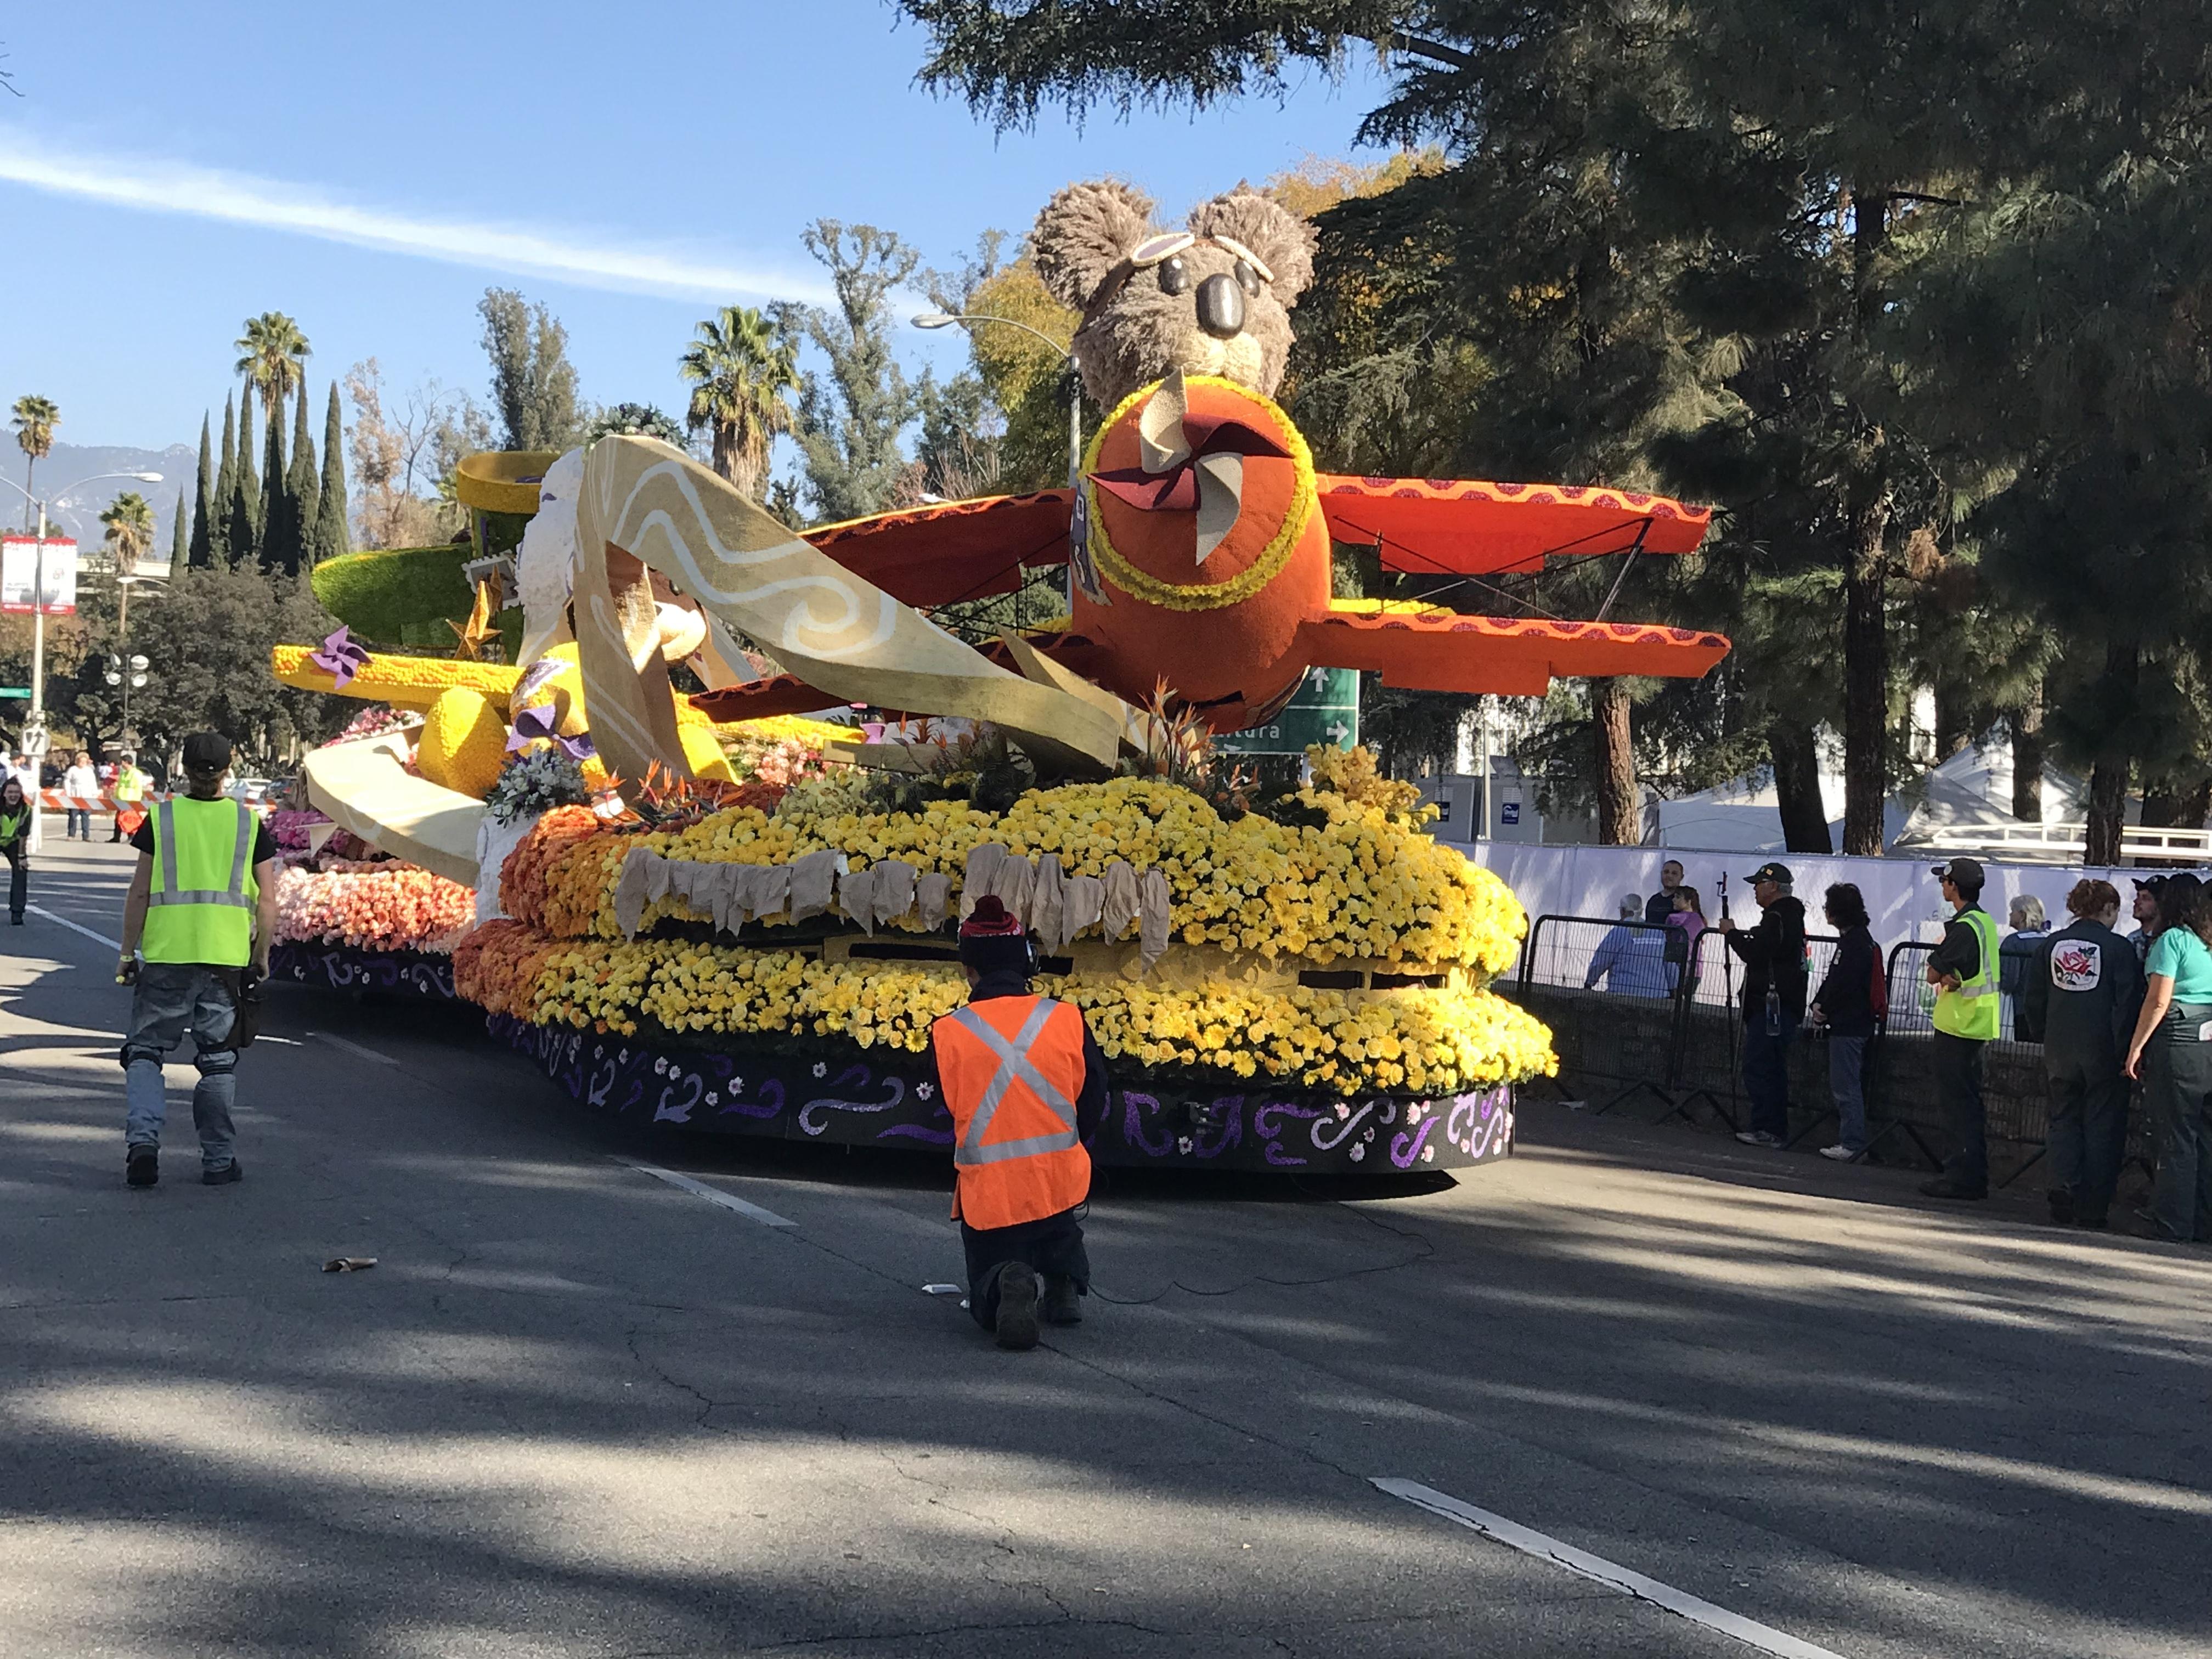 Cal Poly玫瑰花車31日午間完成裝飾,開出裝飾營地。(記者啟鉻/攝影)